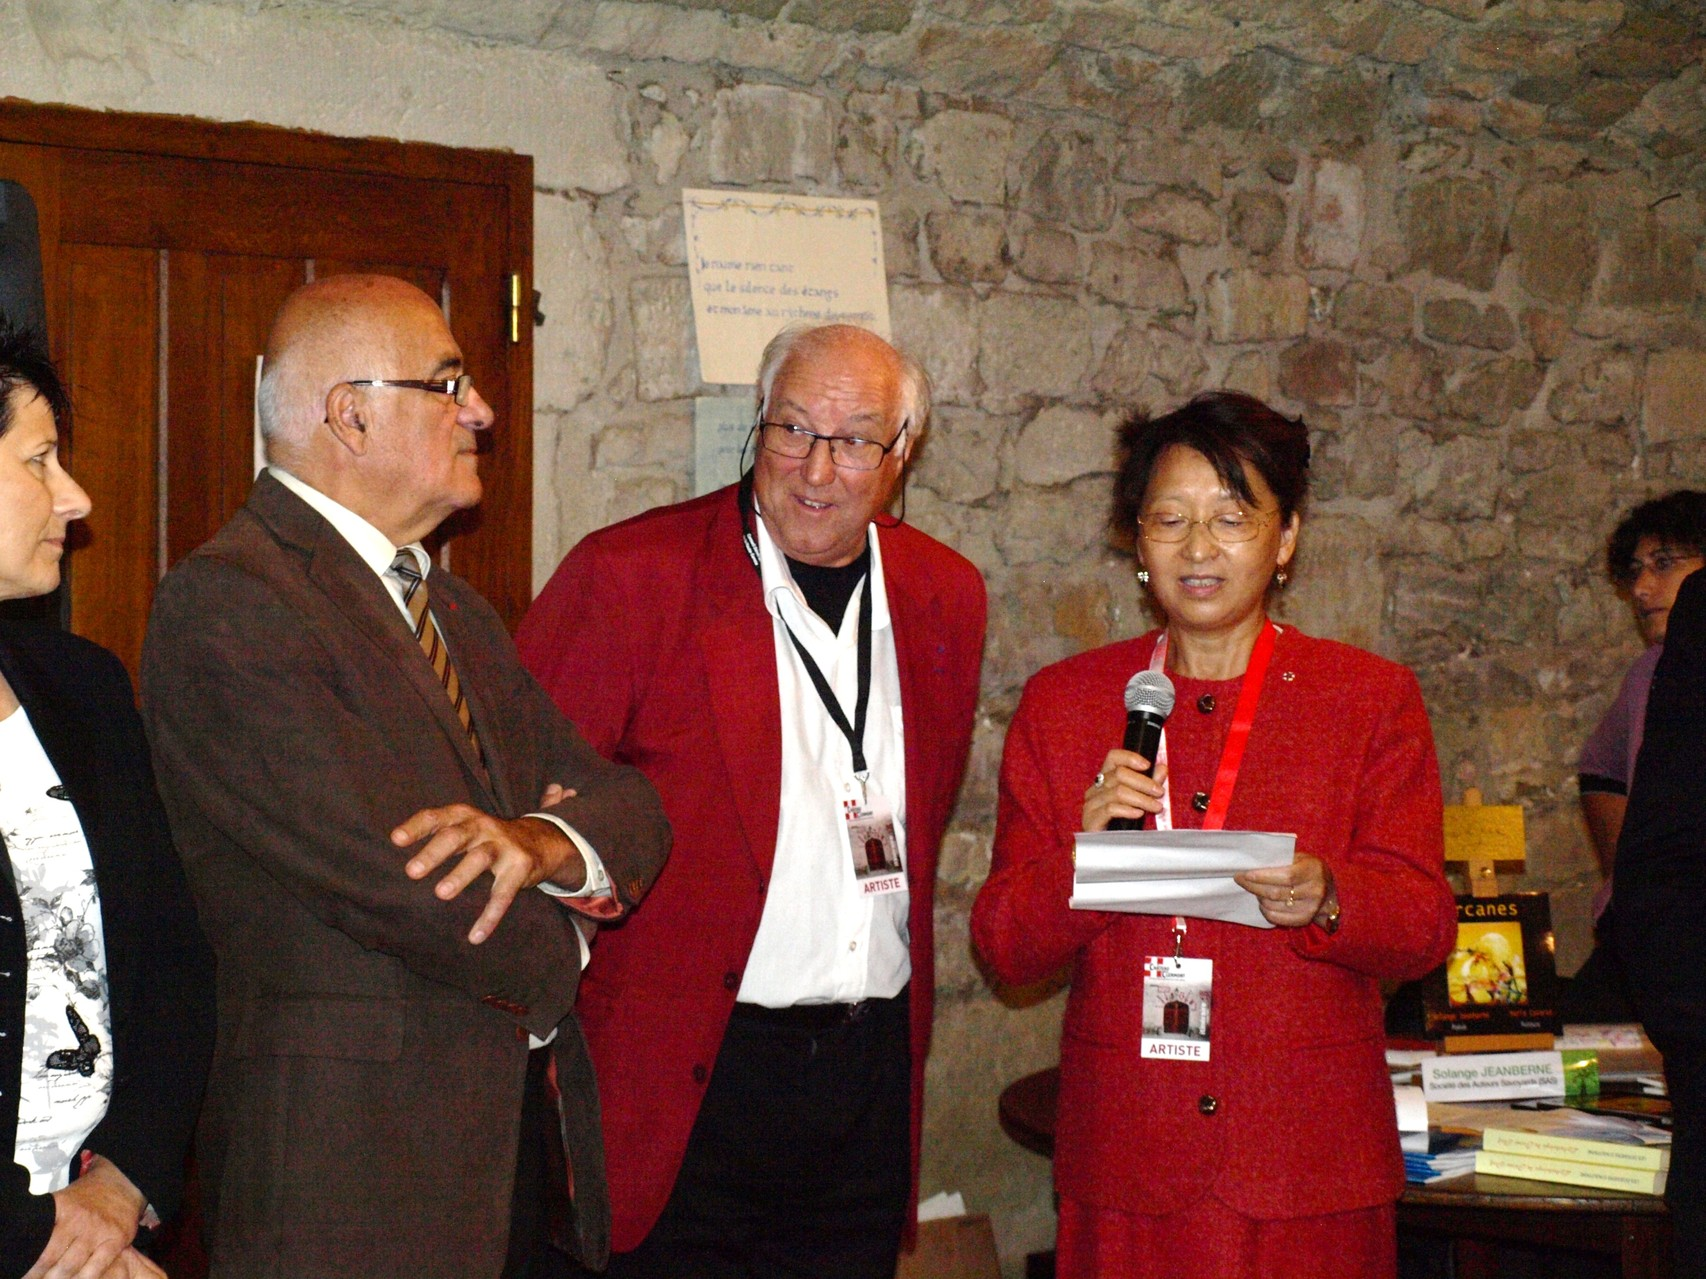 avec Chaoing Sun-Durand Plume d'Or 2014 (sept 2013)